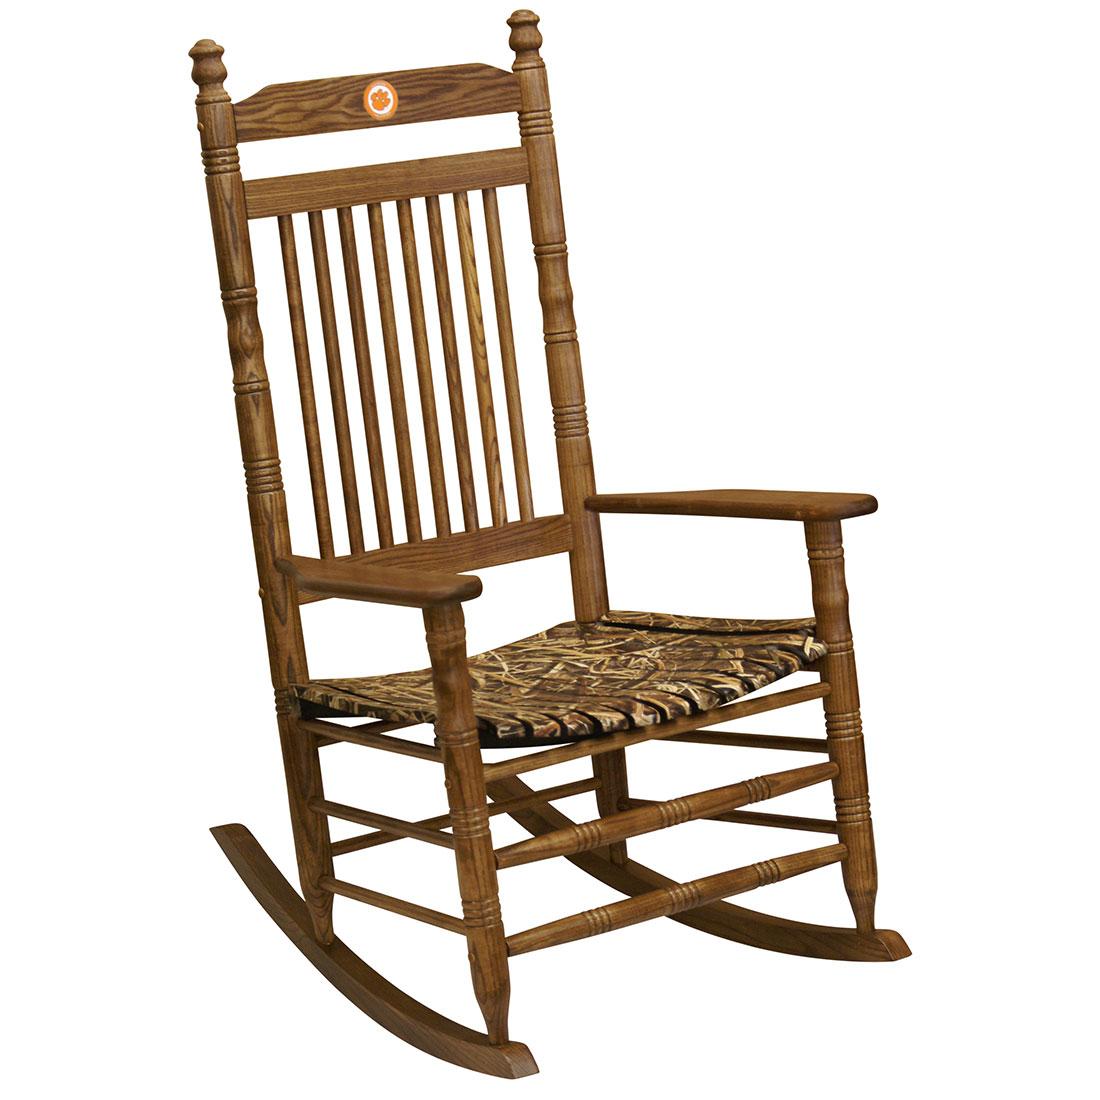 Beau Camo Rocking Chair   ClemsonCamo Rocking Chair   Clemson ...